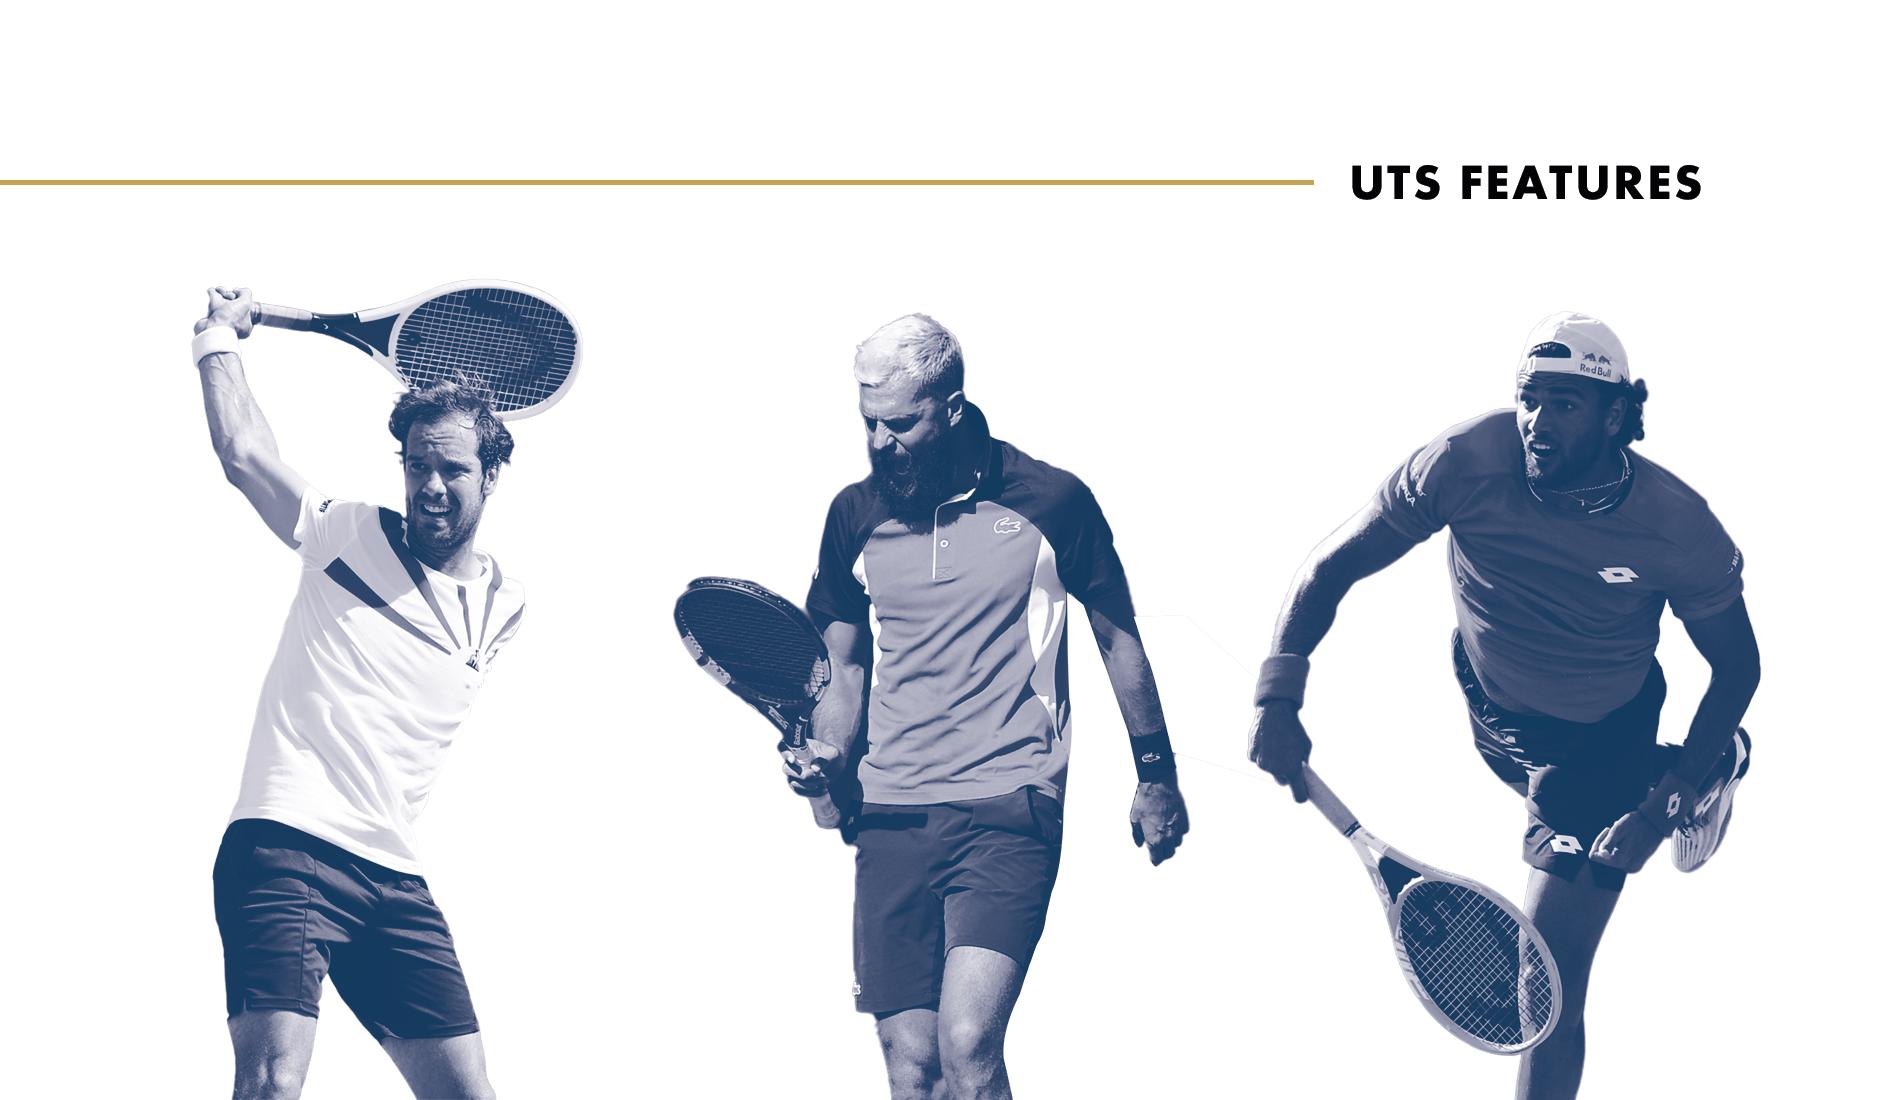 UTS Features - Nicknames